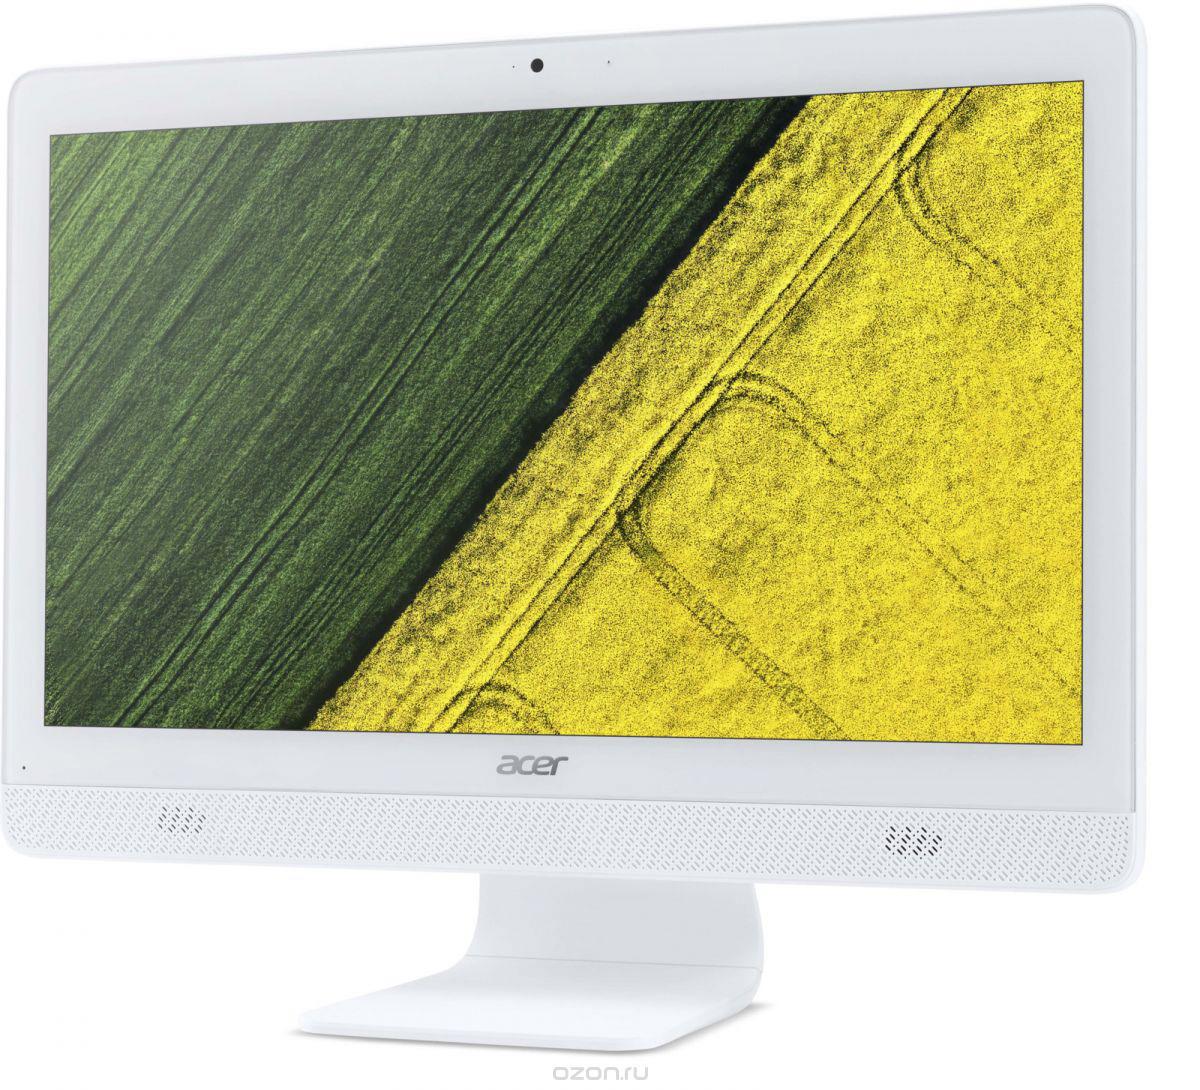 Моноблок Acer Aspire C20-820, DQ.BC6ER.004, 19.5, белый моноблок acer aspire c20 720 dq b6zer 009 белый